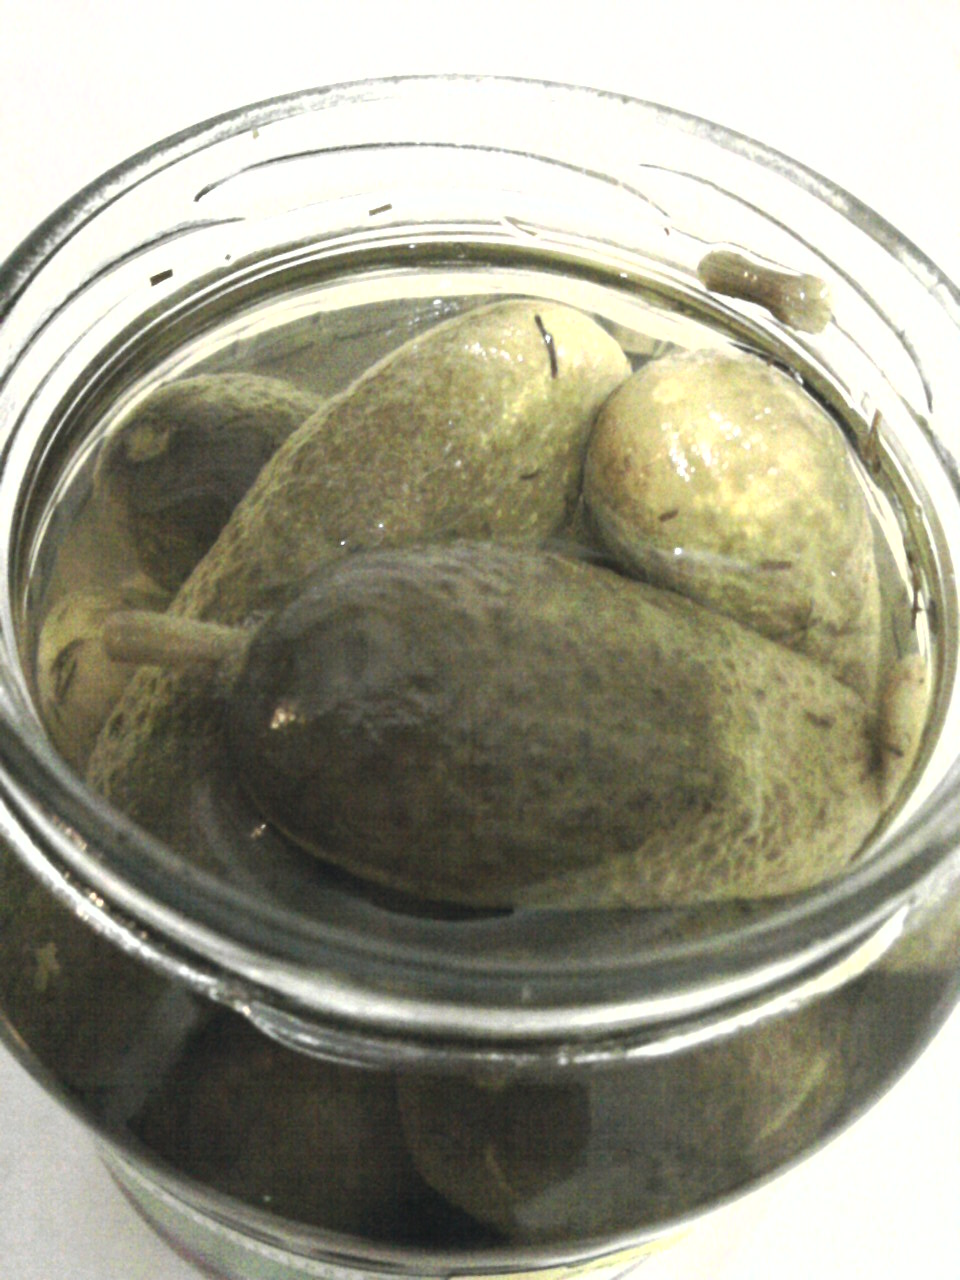 Wardour Pickled Sweet and Sour Gherkins open jar